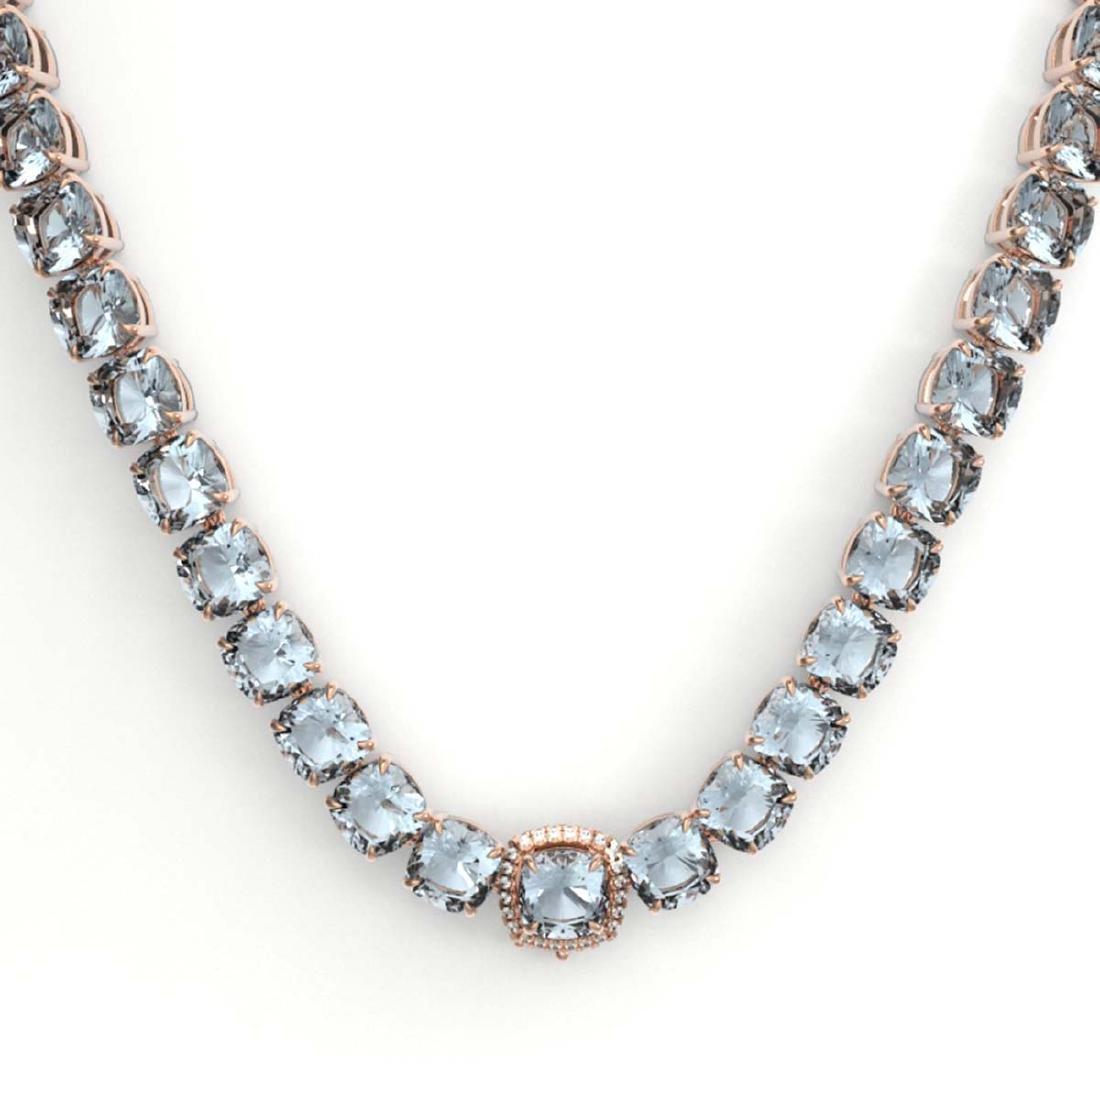 87 ctw Sky Blue Topaz & VS/SI Diamond Necklace 14K Rose - 2